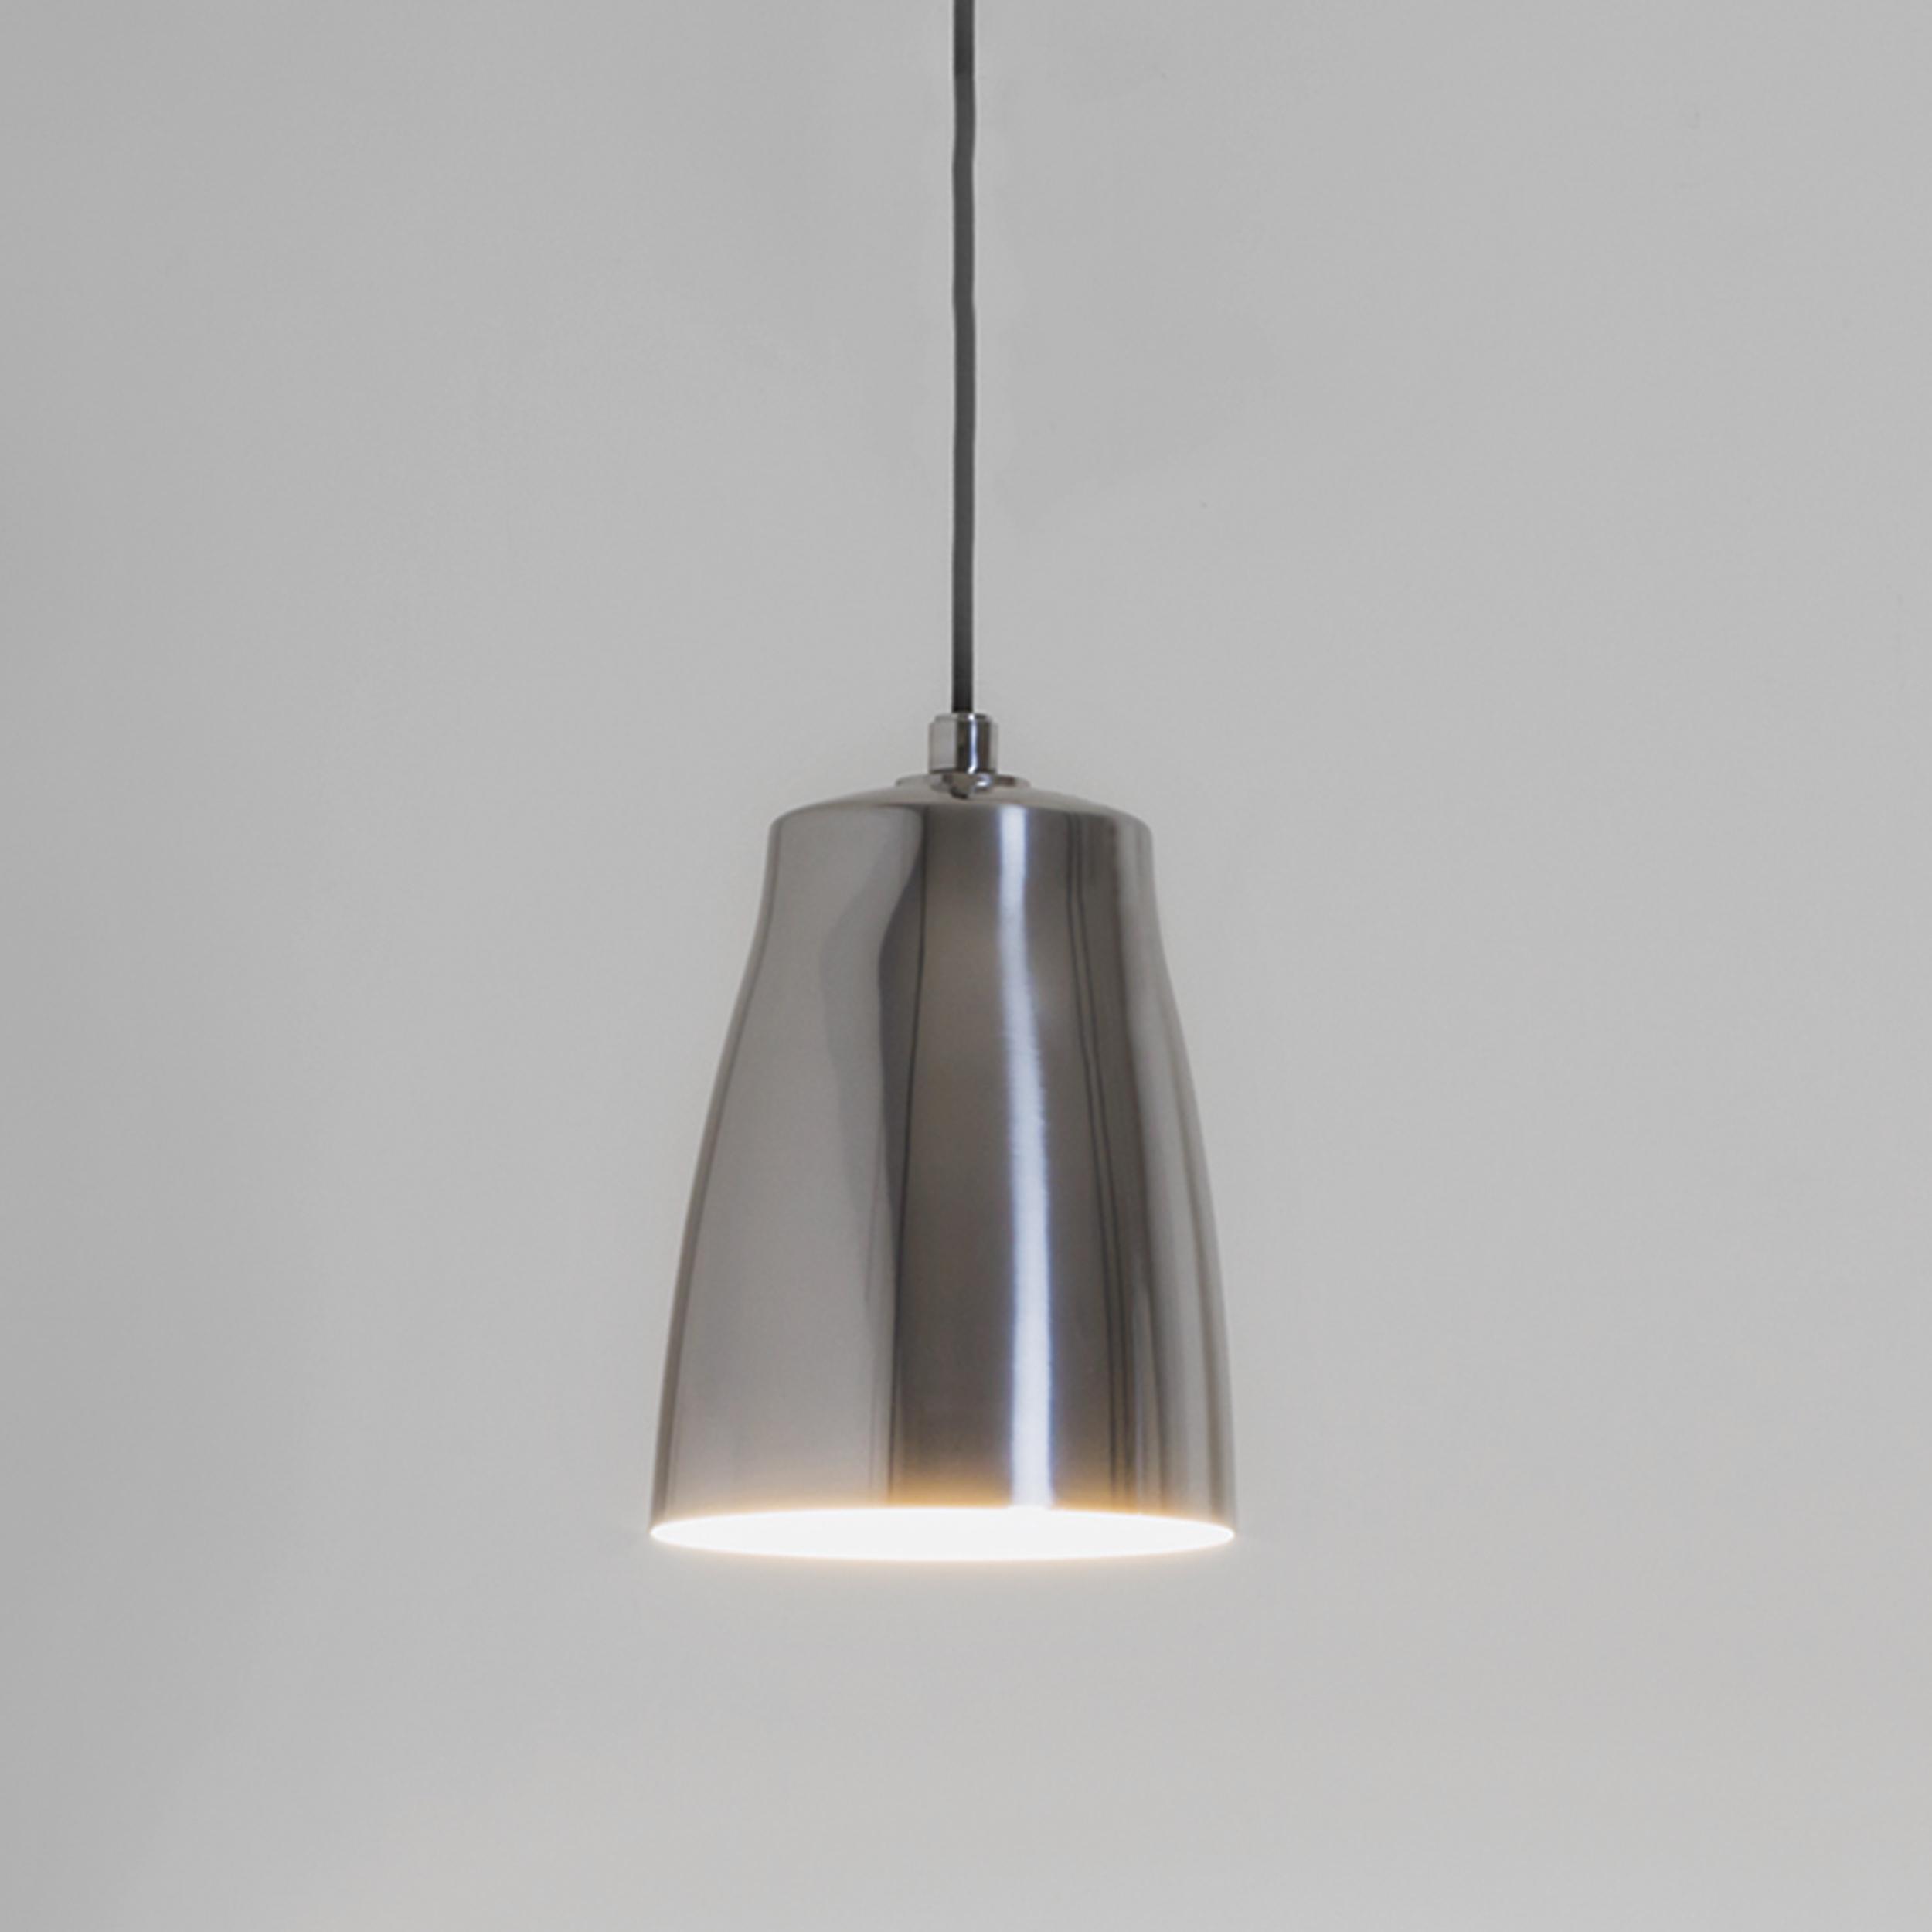 Подвесной светильник Astro Atelier 1224017 (7513), 1xE27x42W, алюминий, металл - фото 1